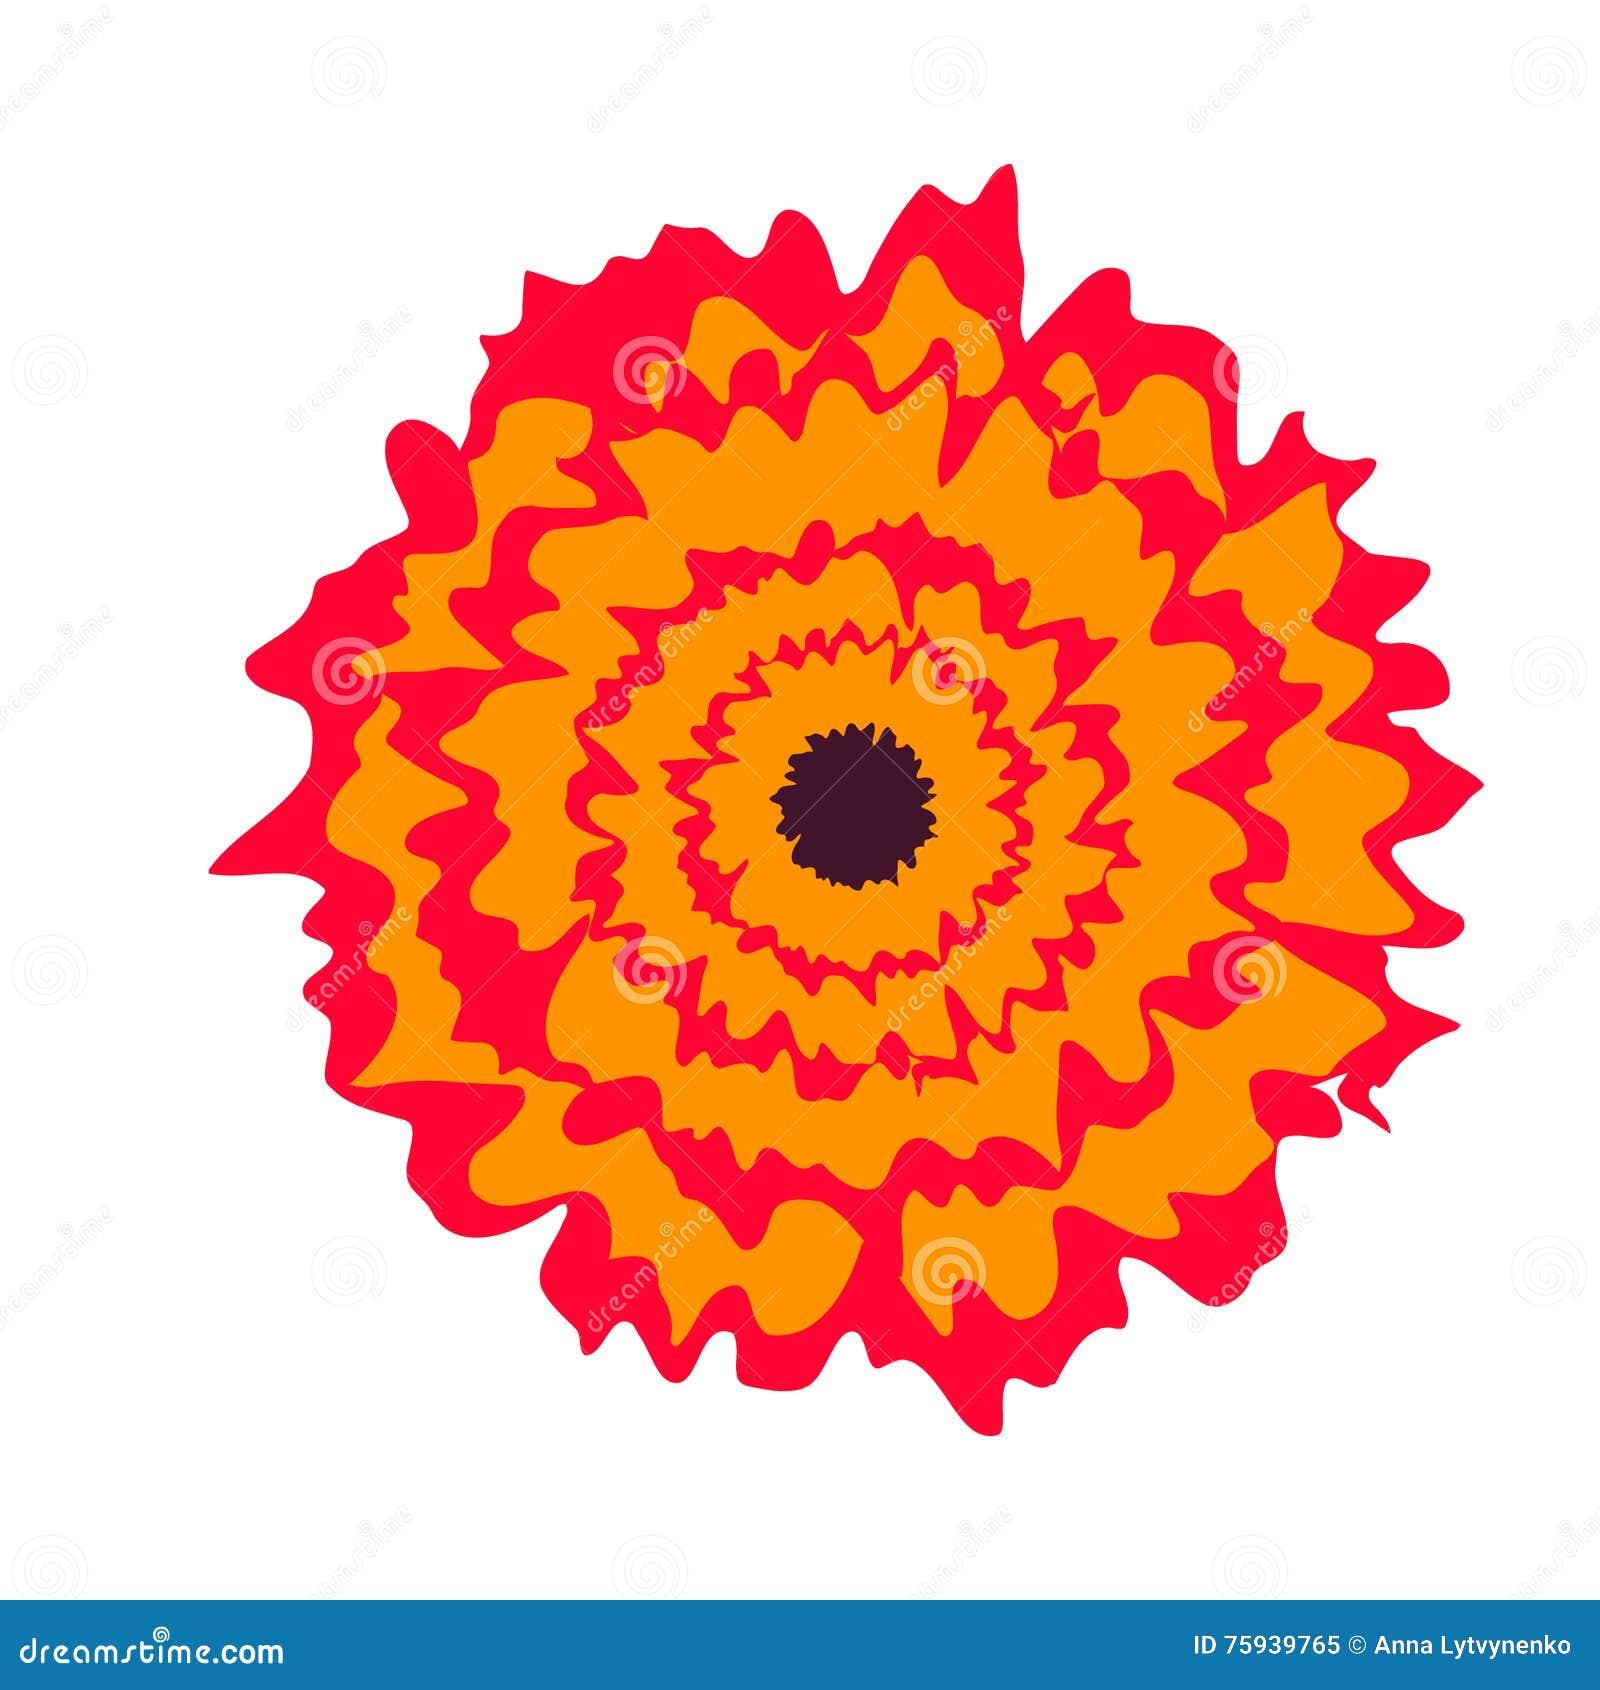 Tropical flower stock illustration. Illustration of color - 75939765